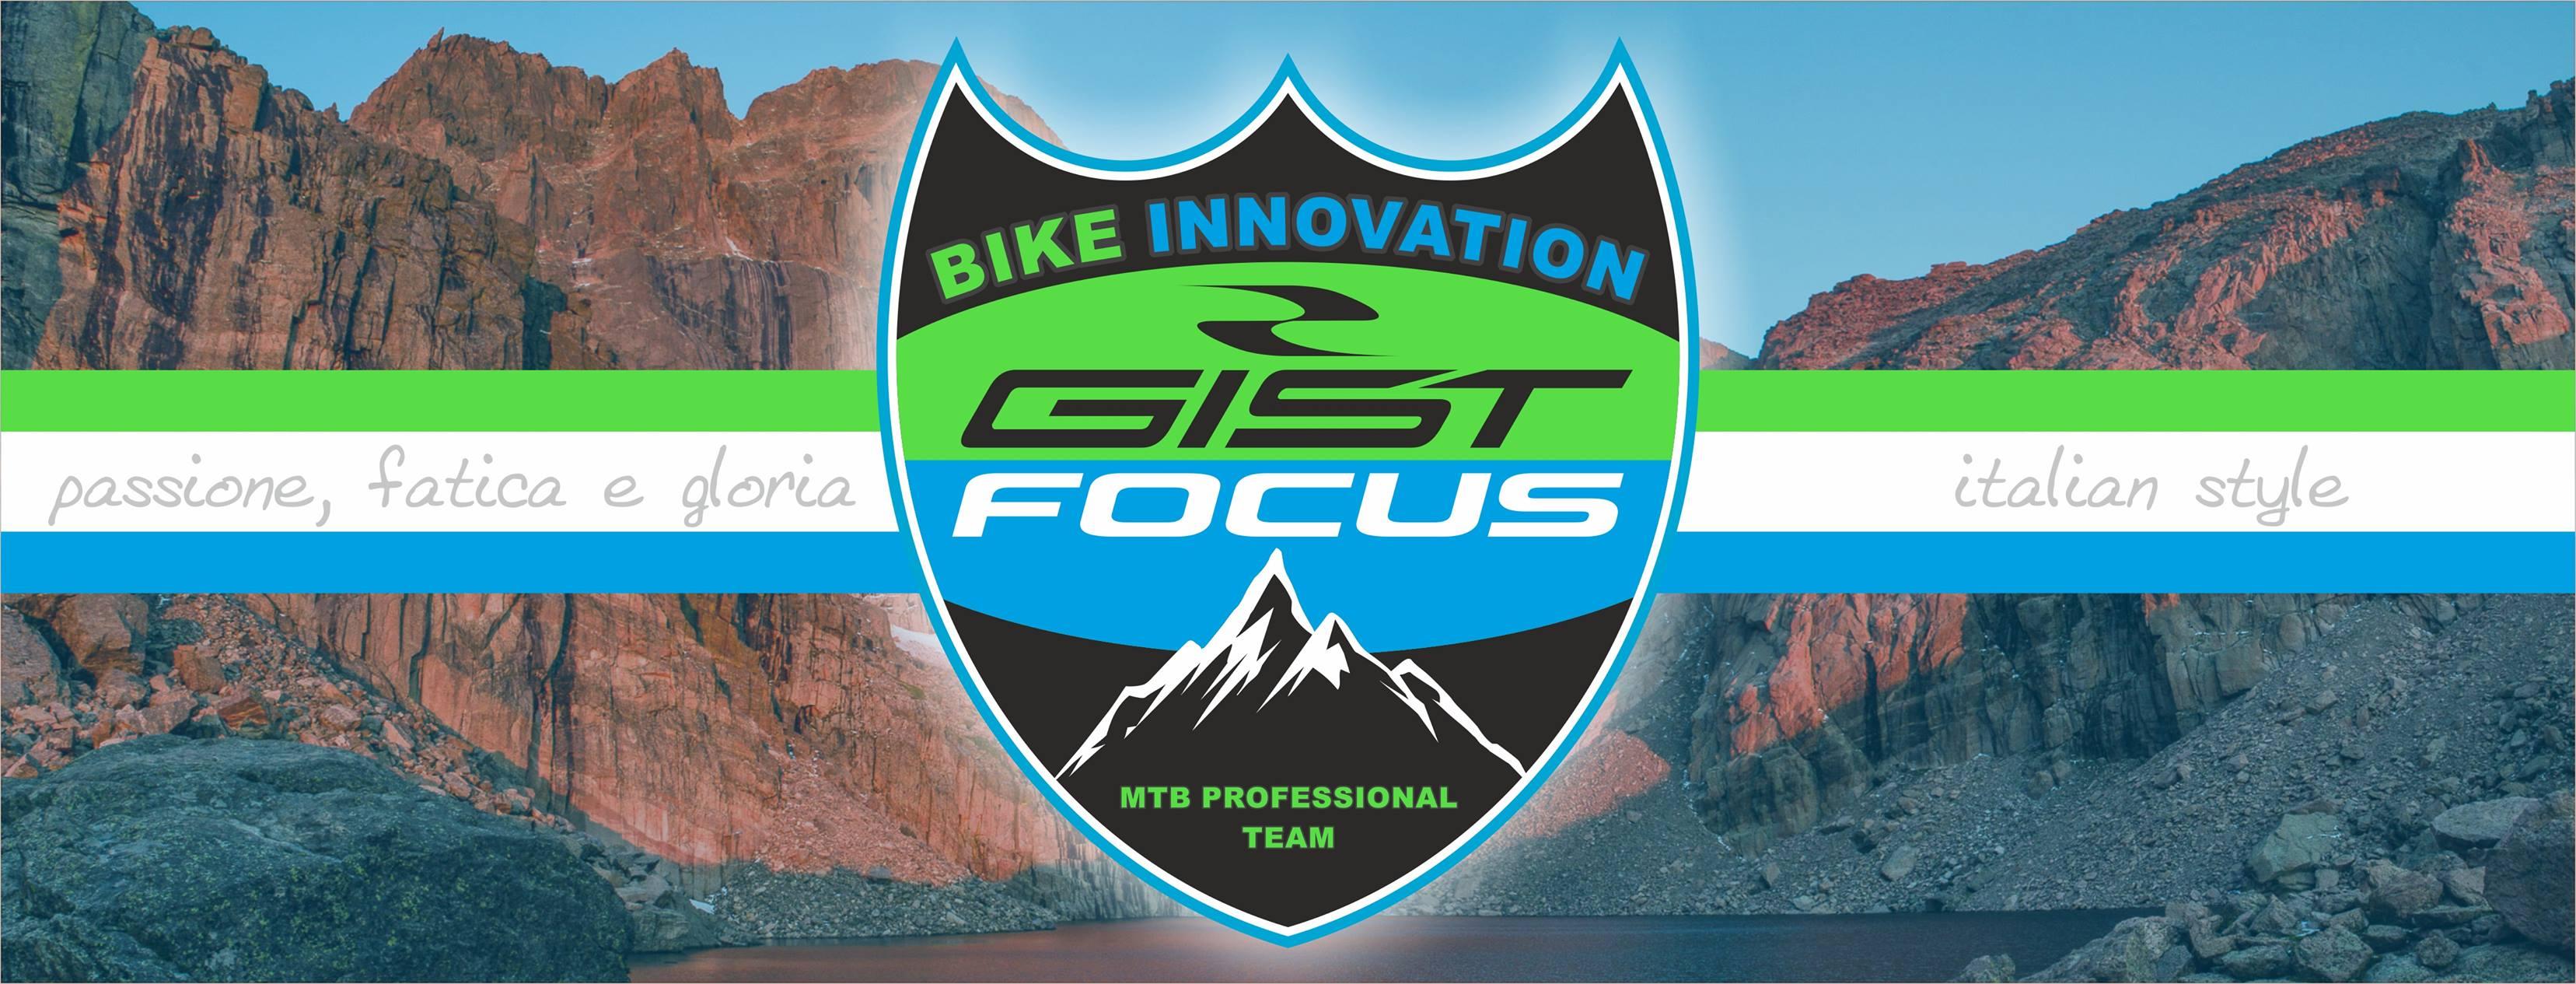 bike innovation team